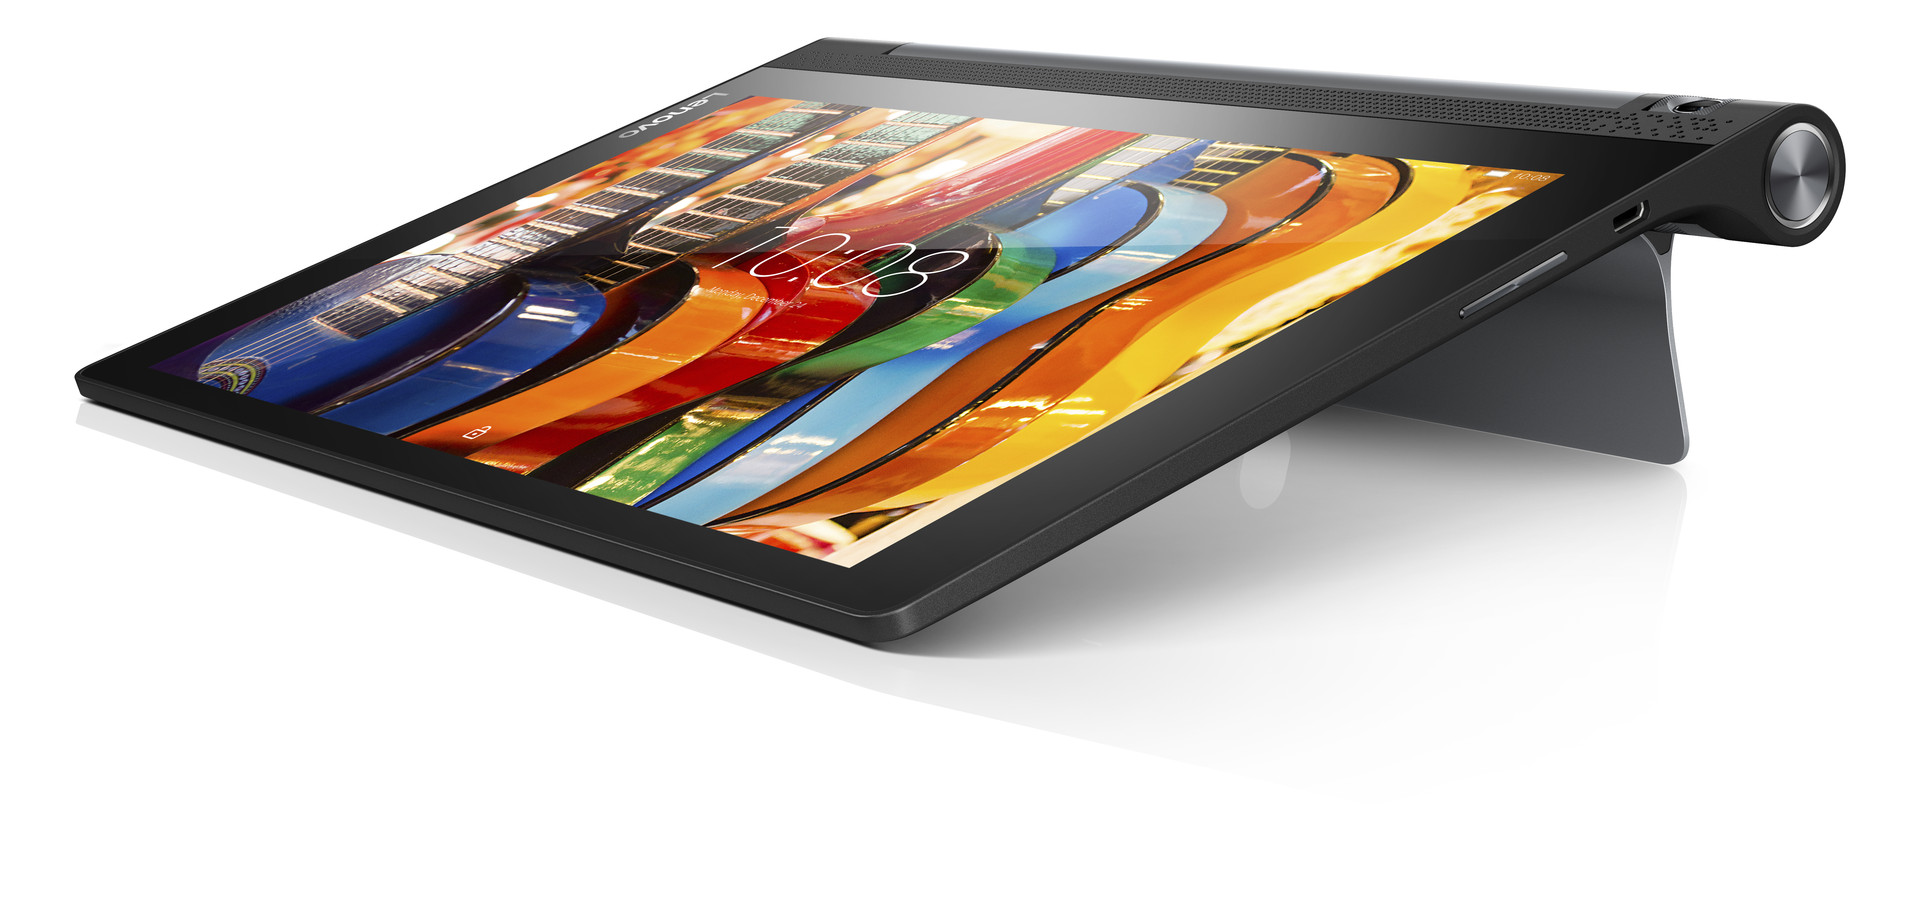 Lenovo Yoga Tab 3 10 Tablet Review - NotebookCheck net Reviews